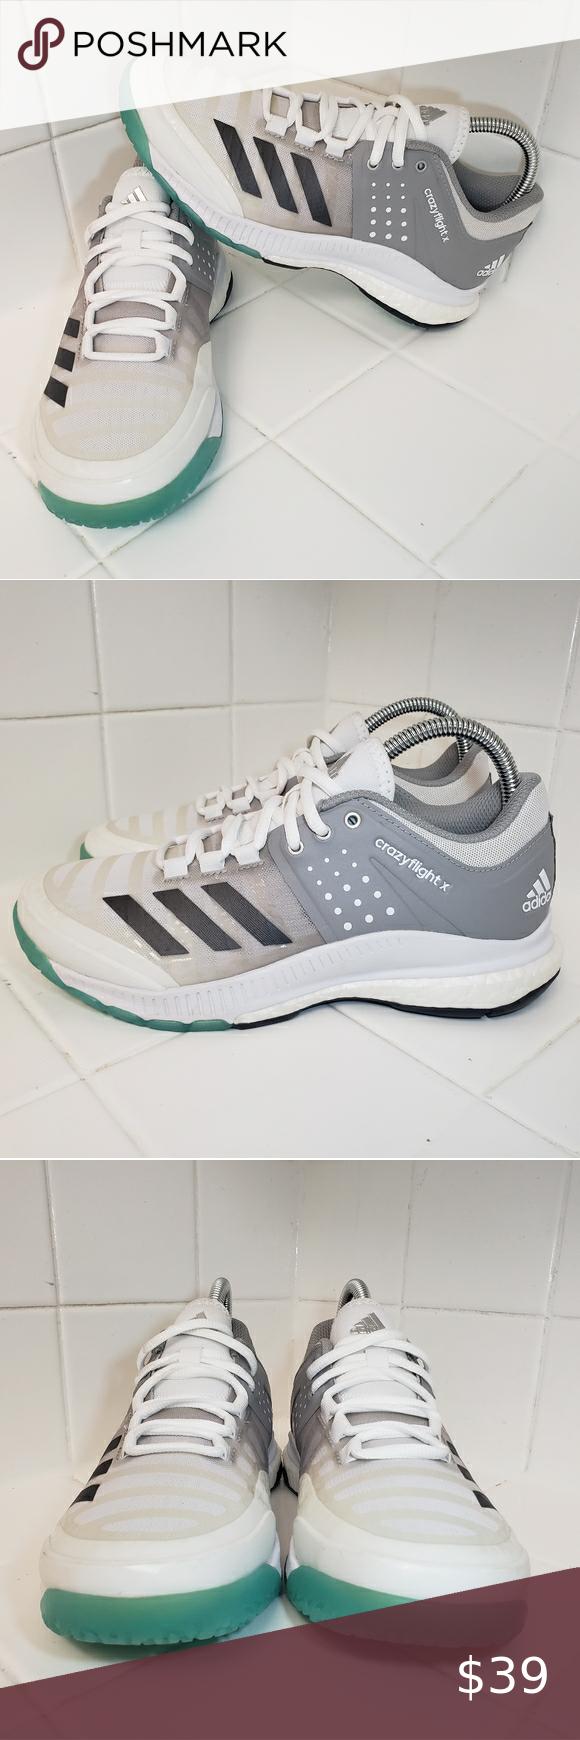 Adidas Crazyflight X Womens Volleyball Shoes 6 5 In 2020 Volleyball Shoes Shoes Volleyball